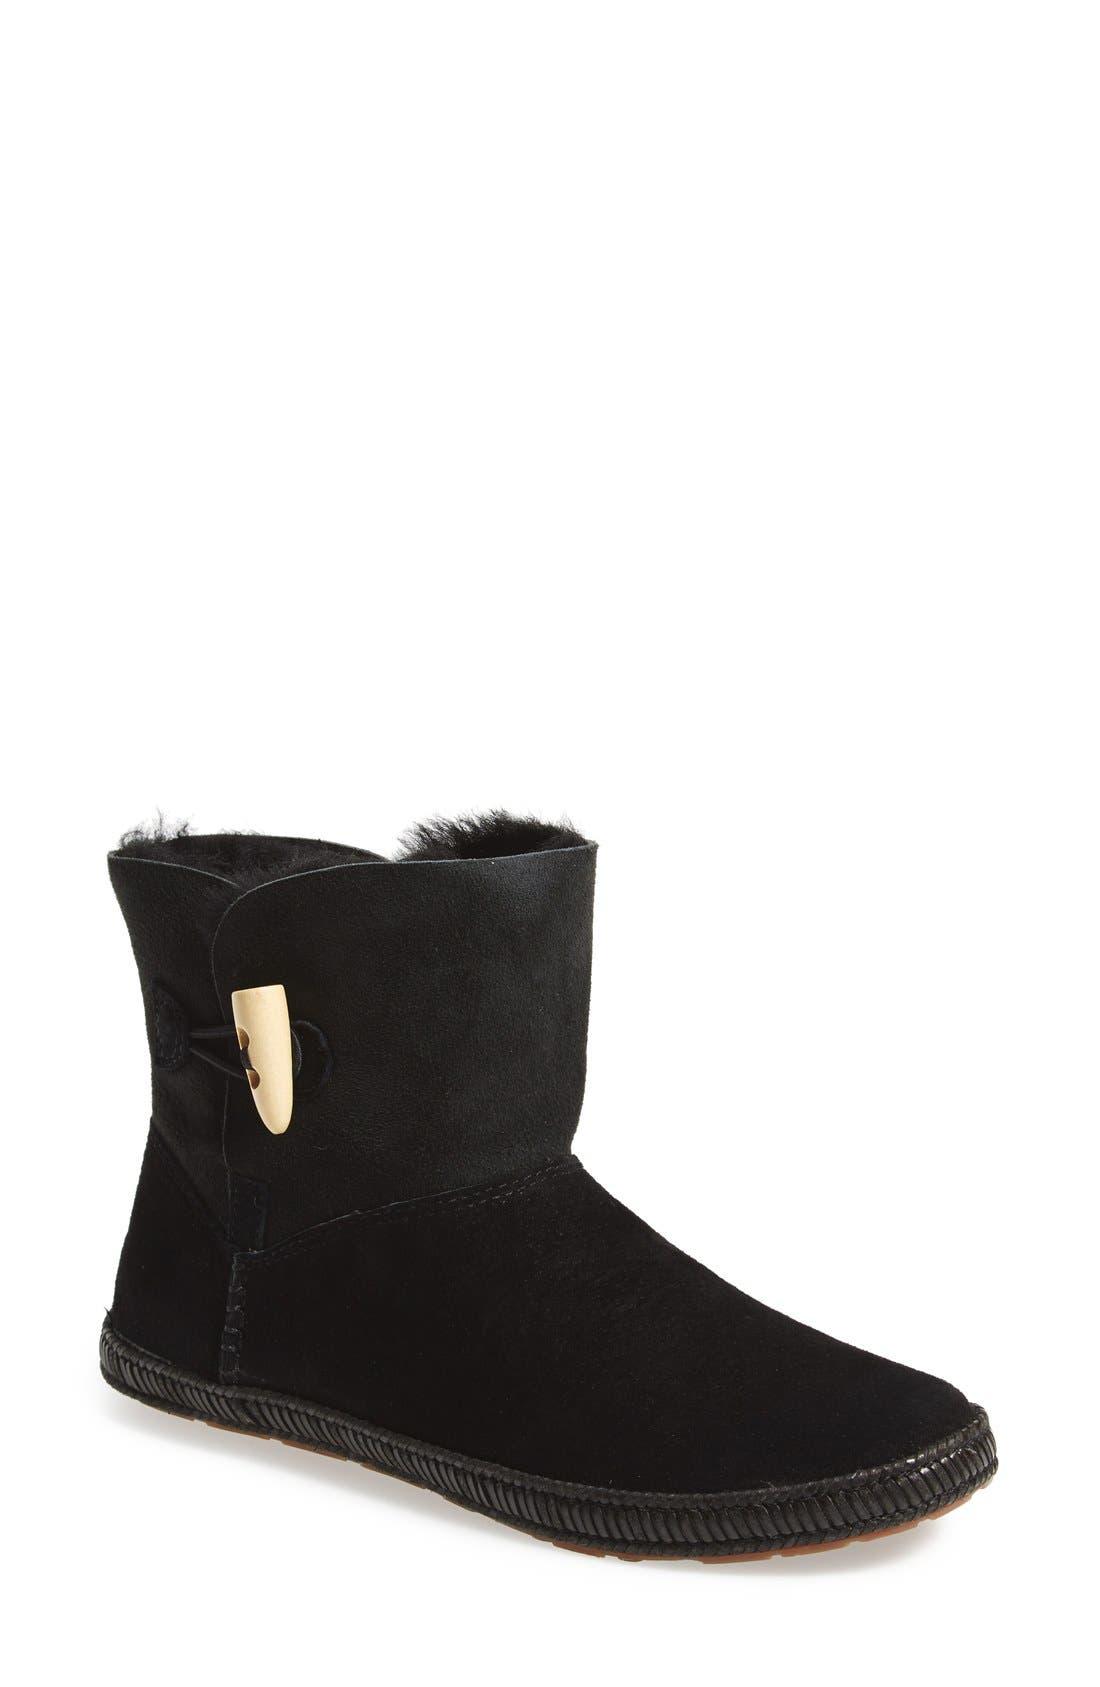 'Garnet' Toggle Boot,                         Main,                         color, 001